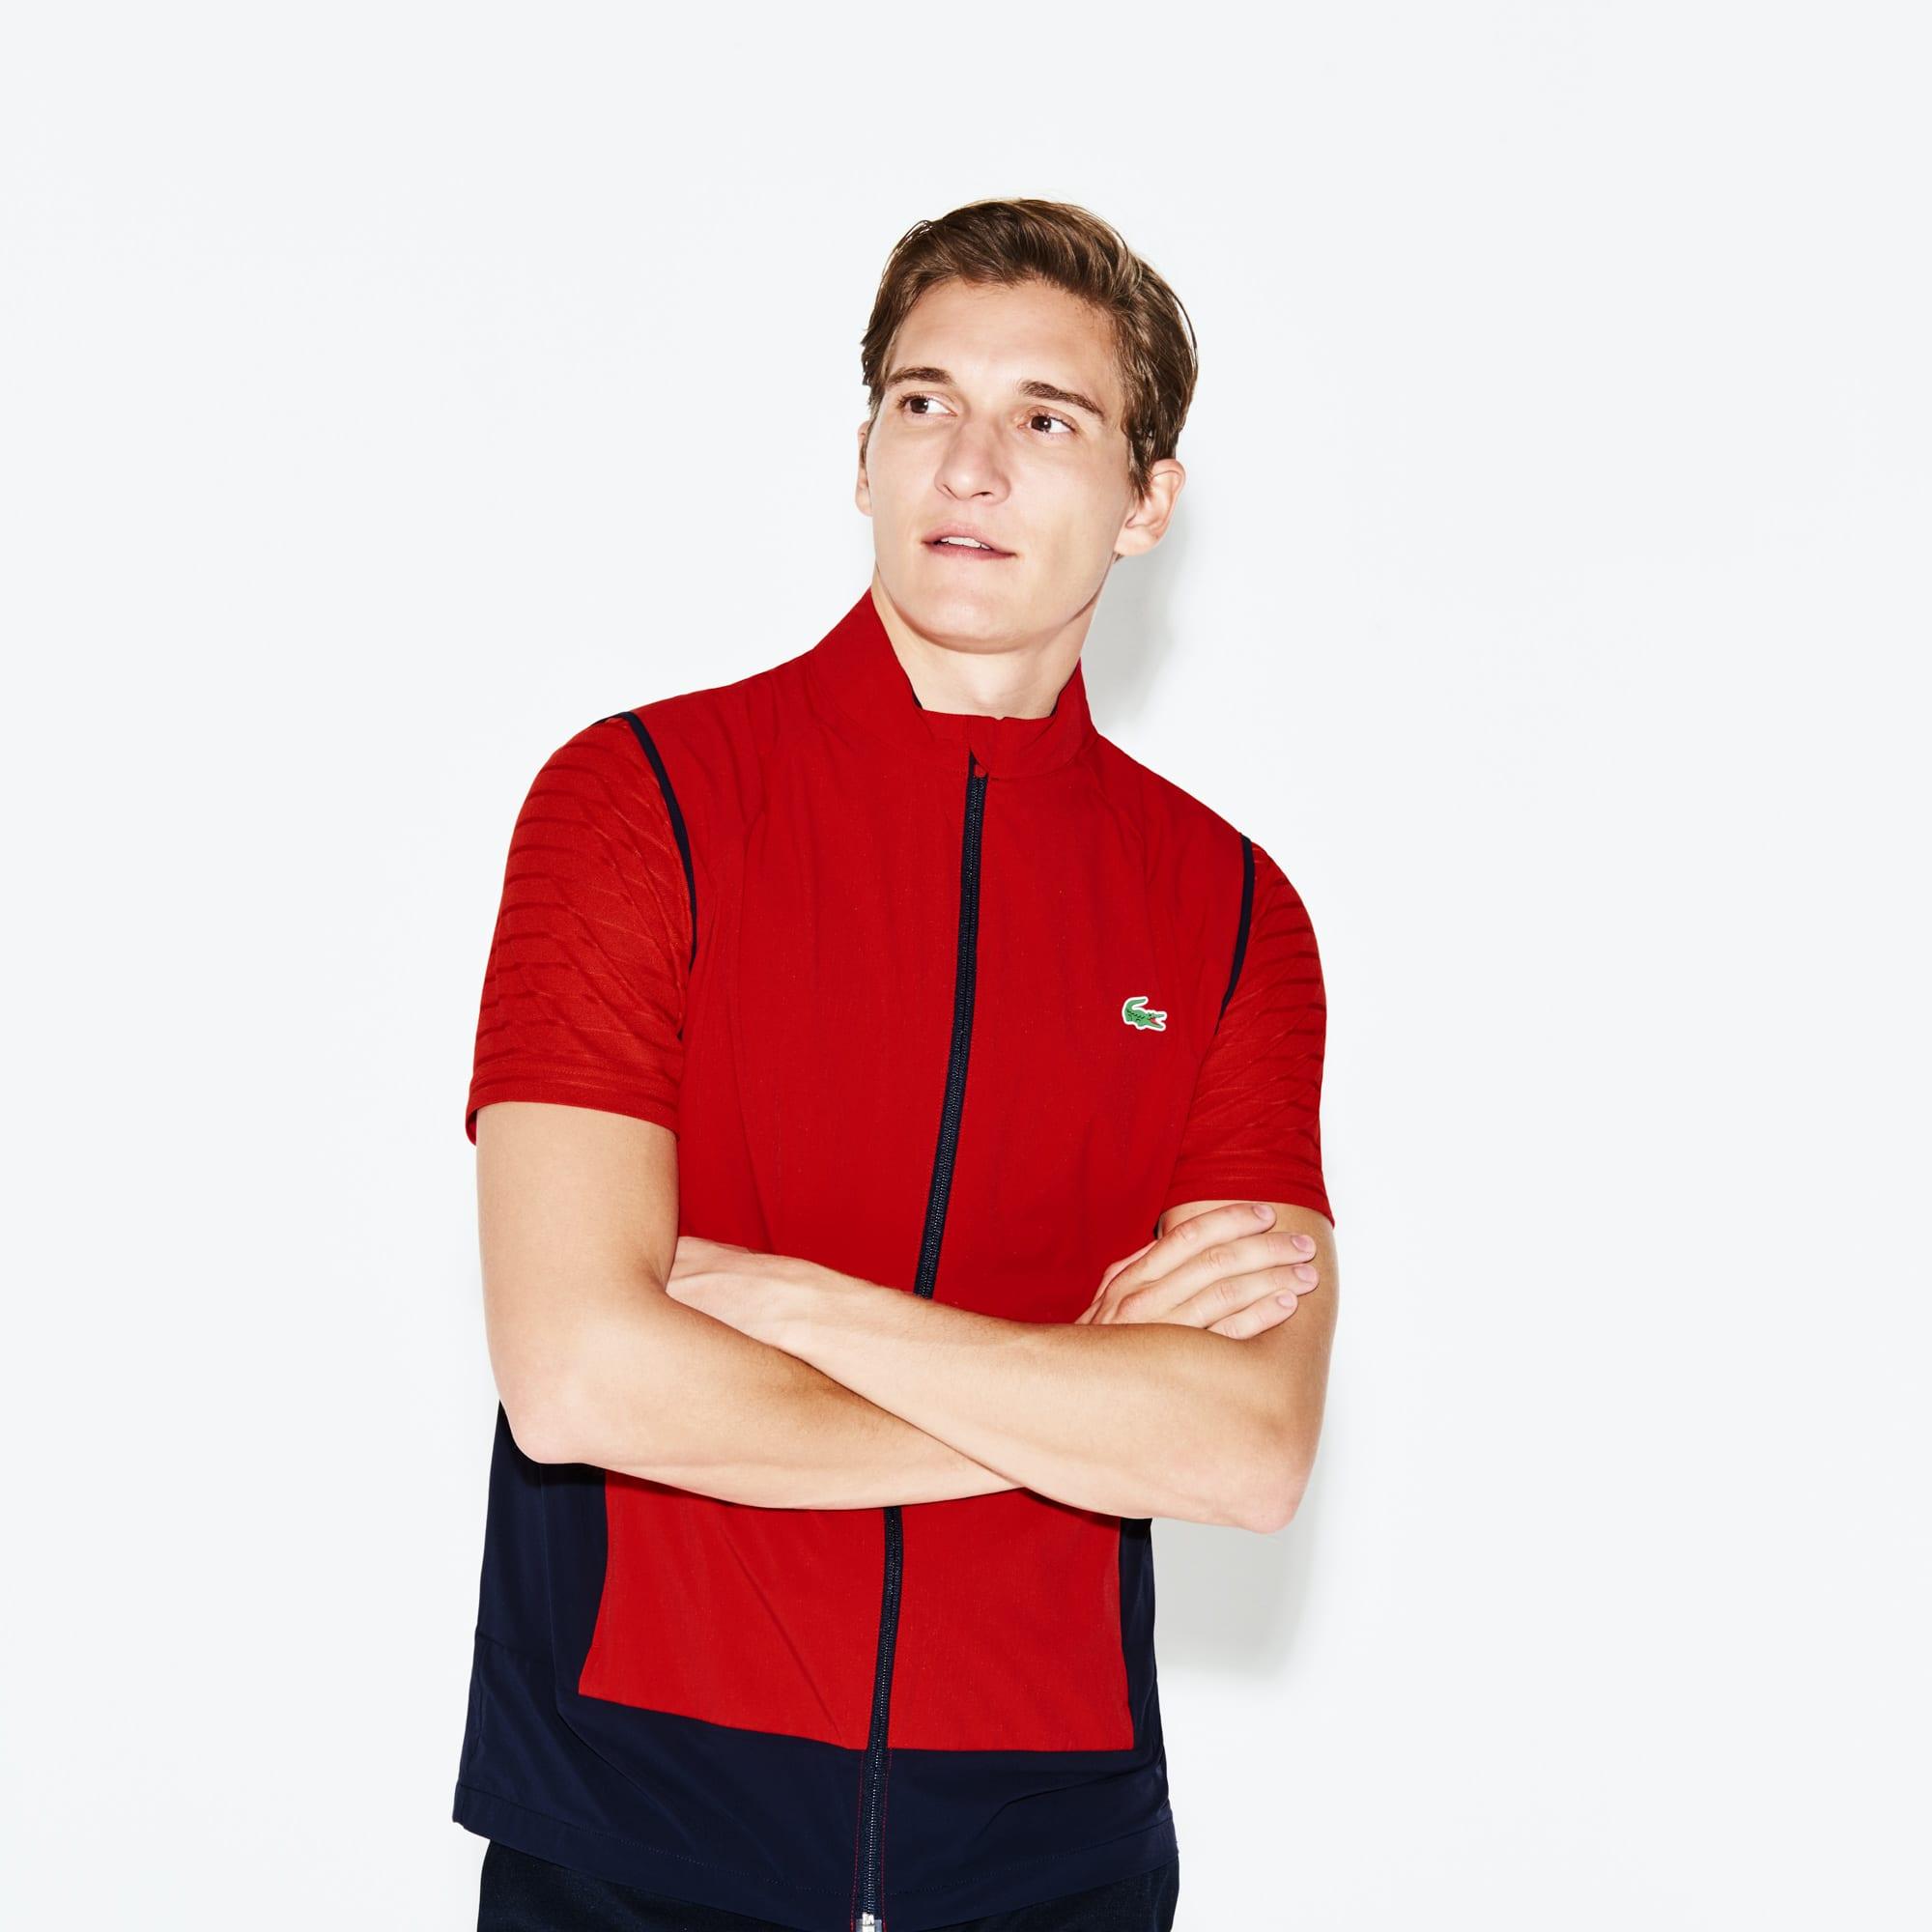 Men's Lacoste SPORT Colorblock Technical Taffeta Golf Quilted Vest